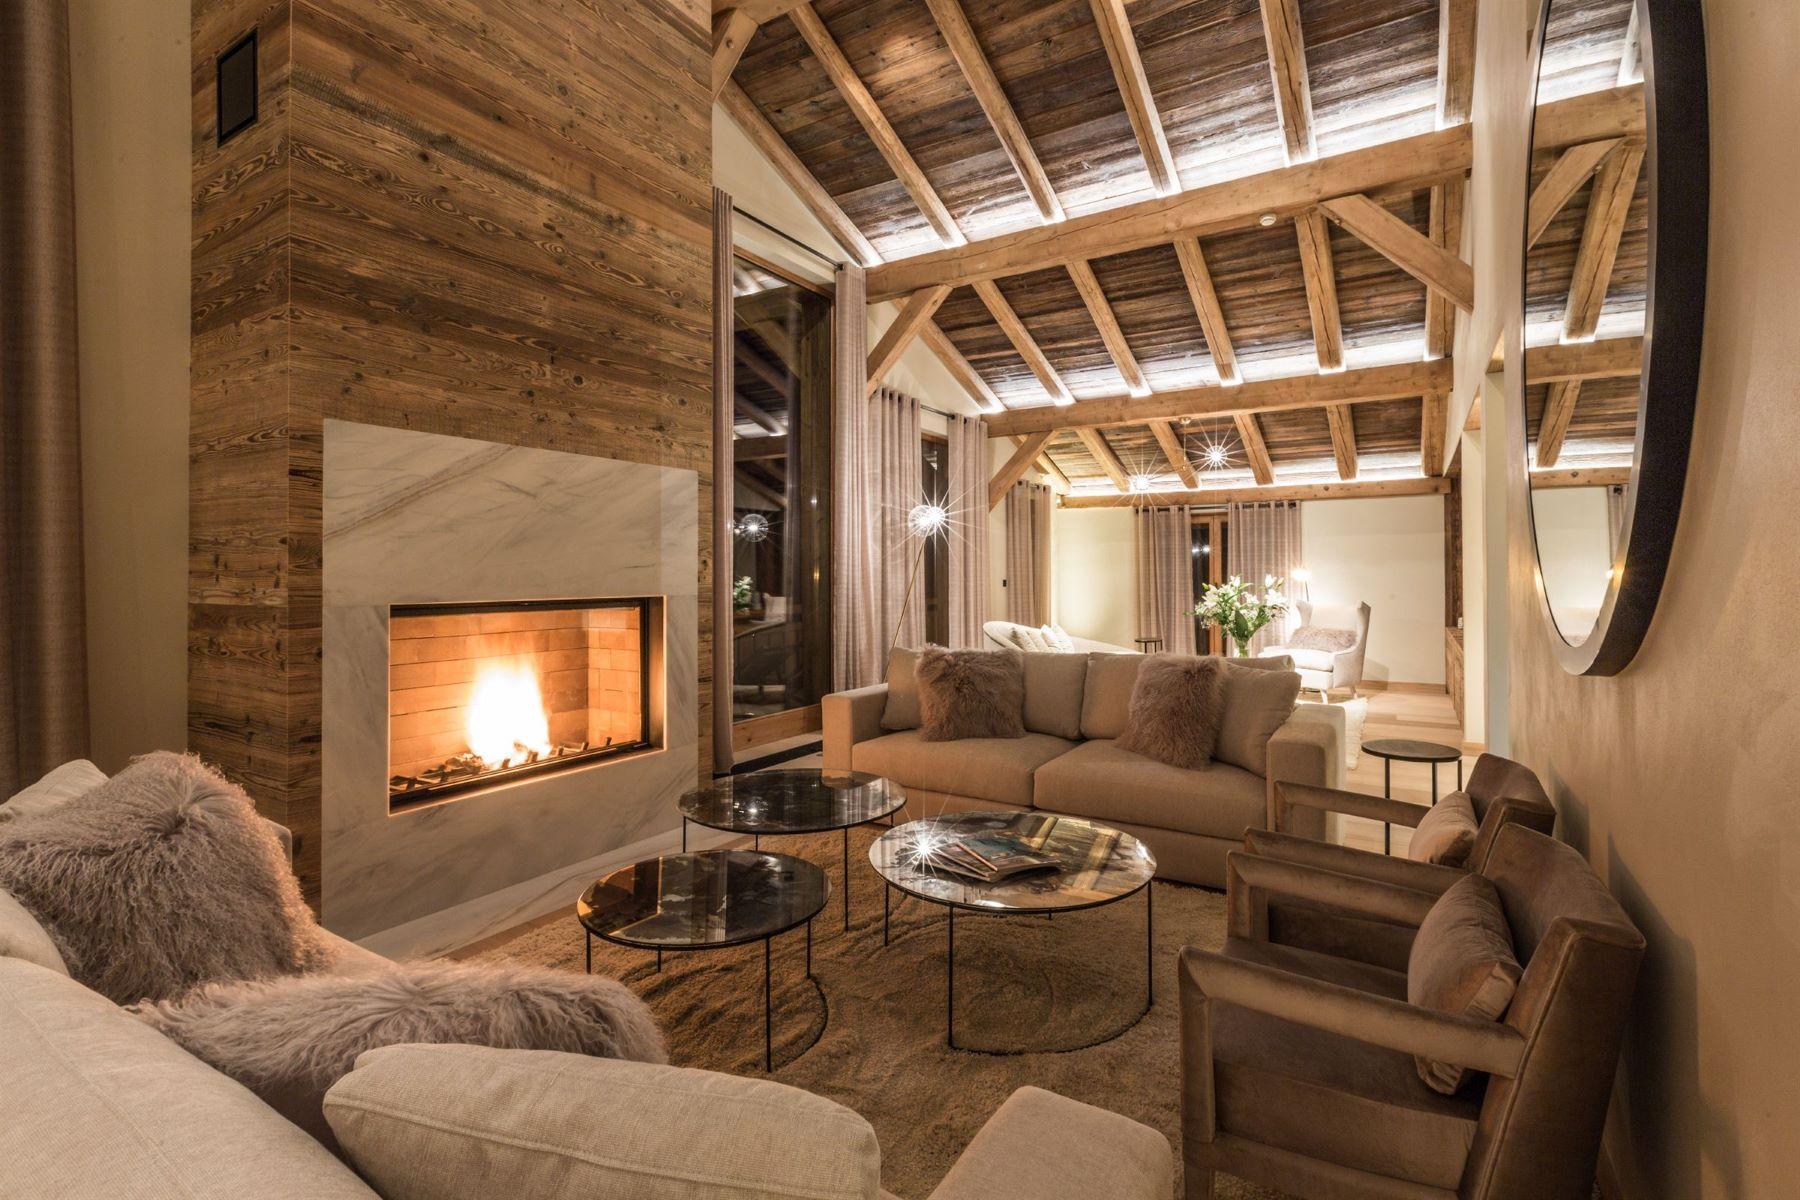 Single Family Home for Sale at Chalet Dali - Luxury chalet close by Megève Megeve, Rhone-Alpes 74120 France